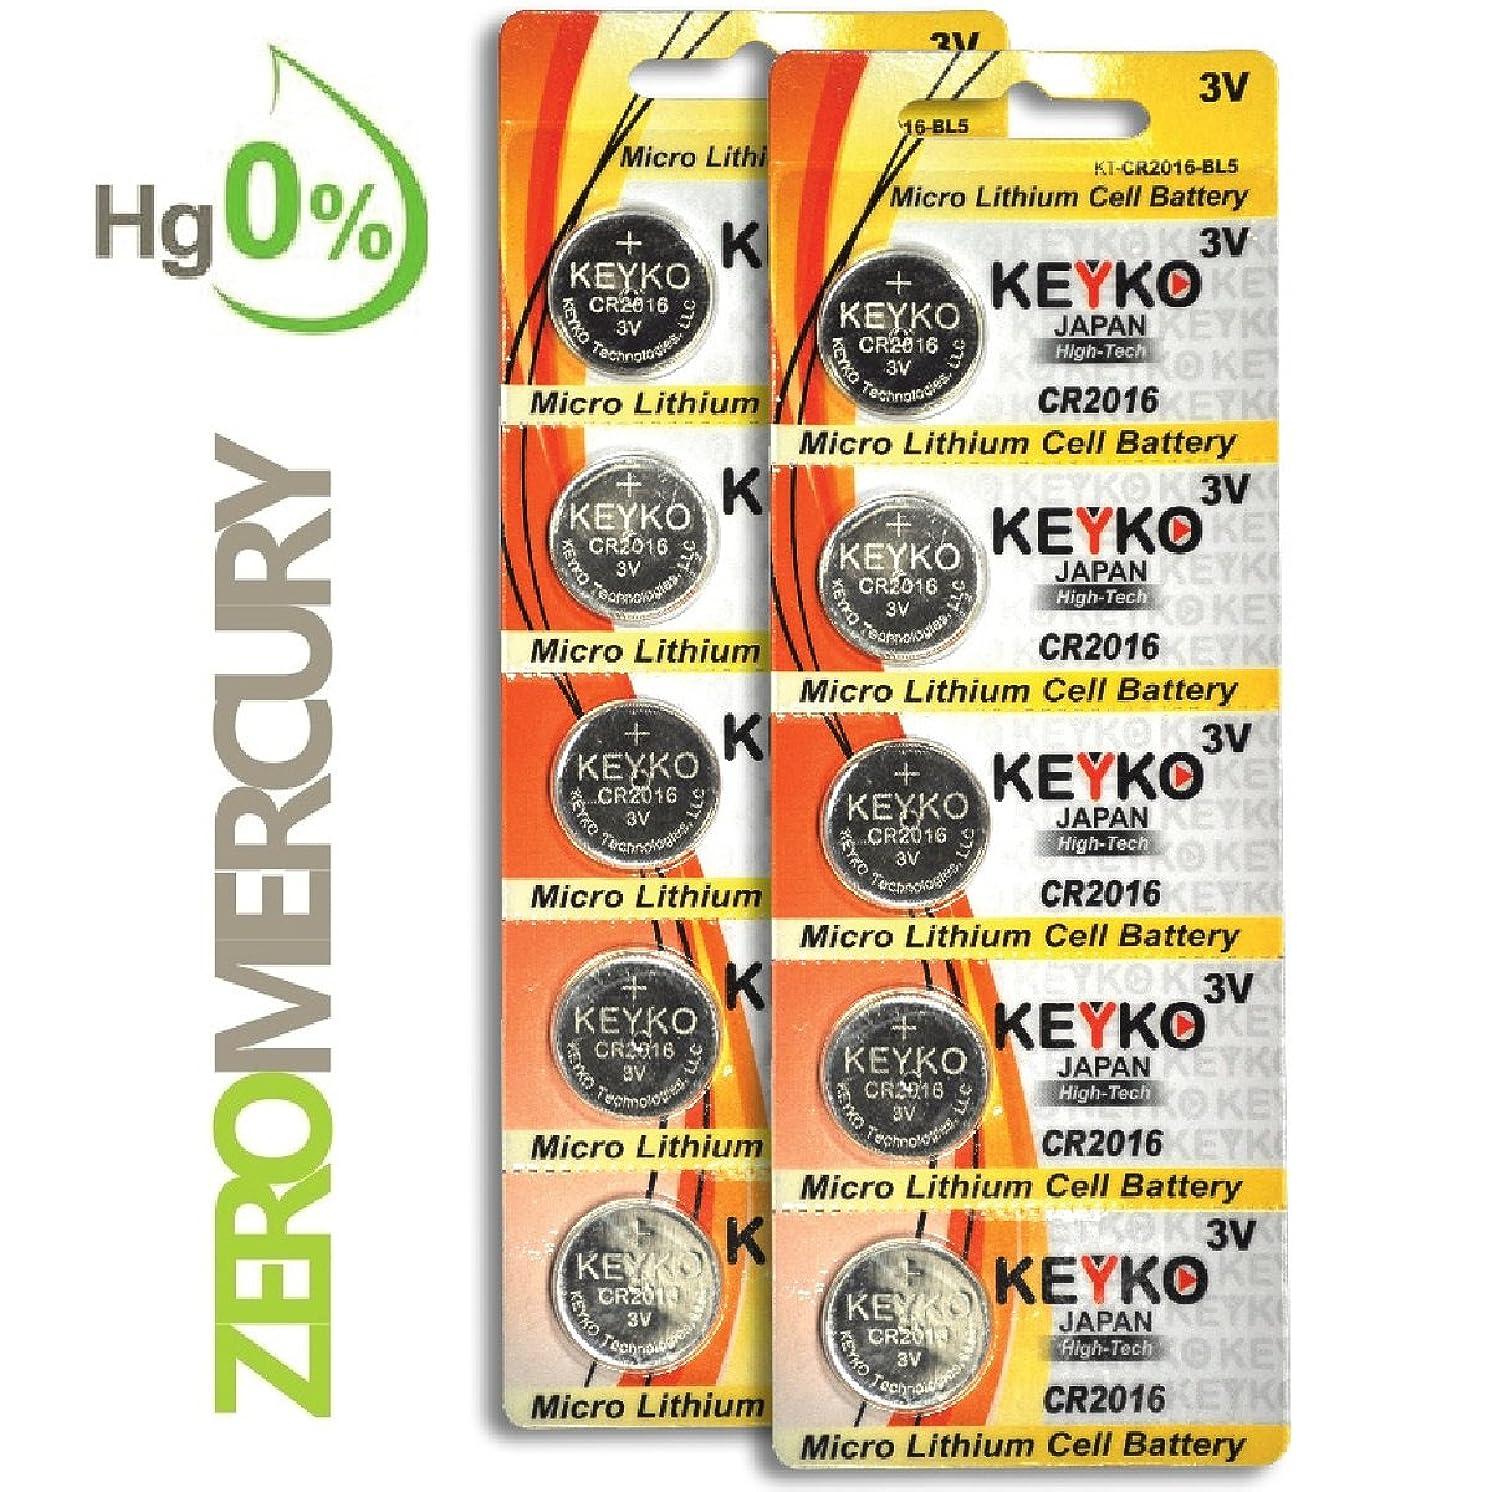 CR2016 Battery - 10 pcs Pack - 3V Lithium Buttom Coin Cell Battery Type 3.0 Volt: 2016 DL2016 ECR2016 Genuine KEYKO Supreme High Energy